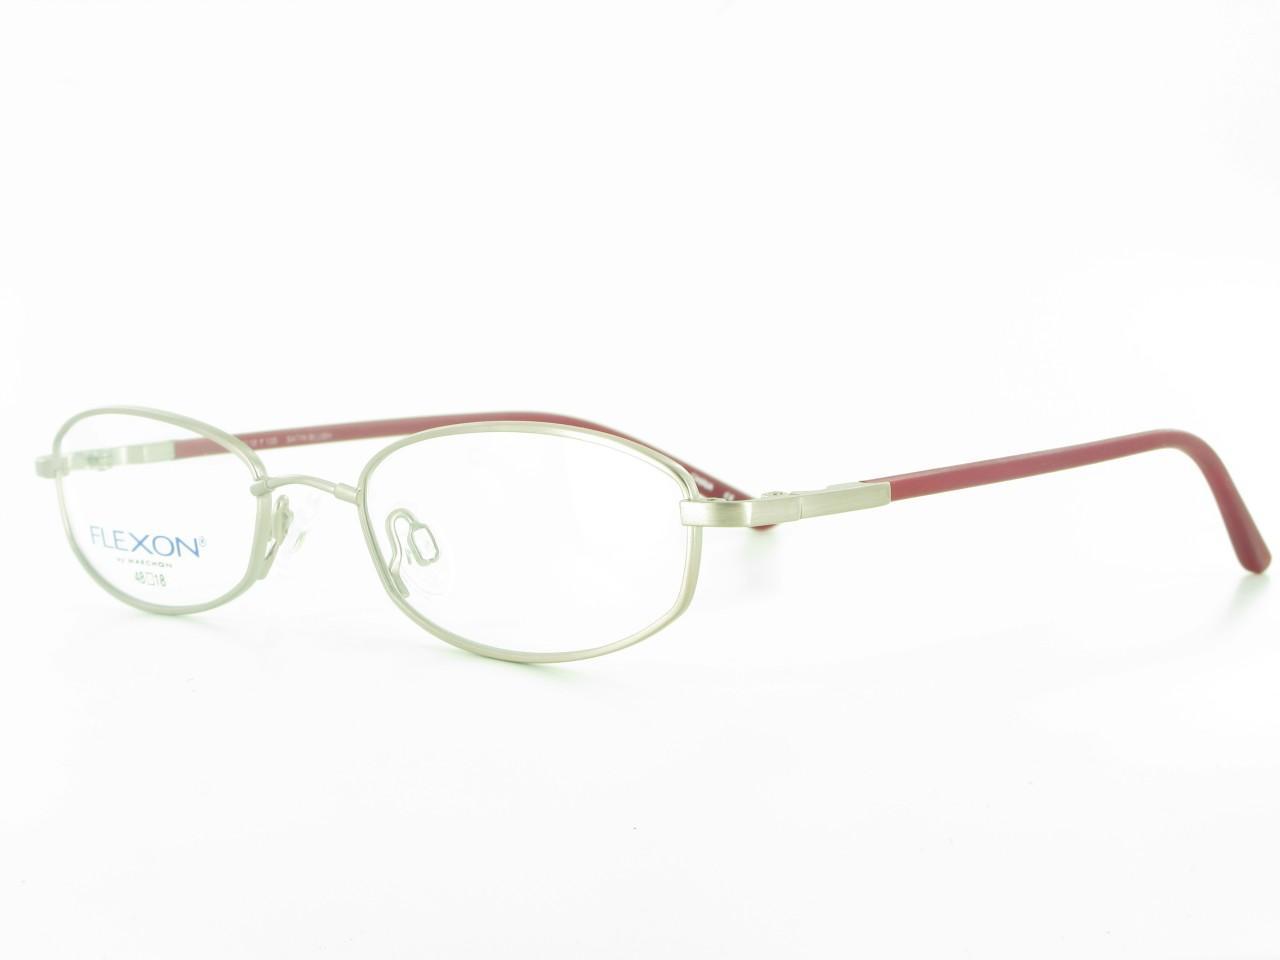 Bendable Metal Eyeglass Frames : Marchon Flexon 659 Flexible Eyeglass Frames Small Metal ...